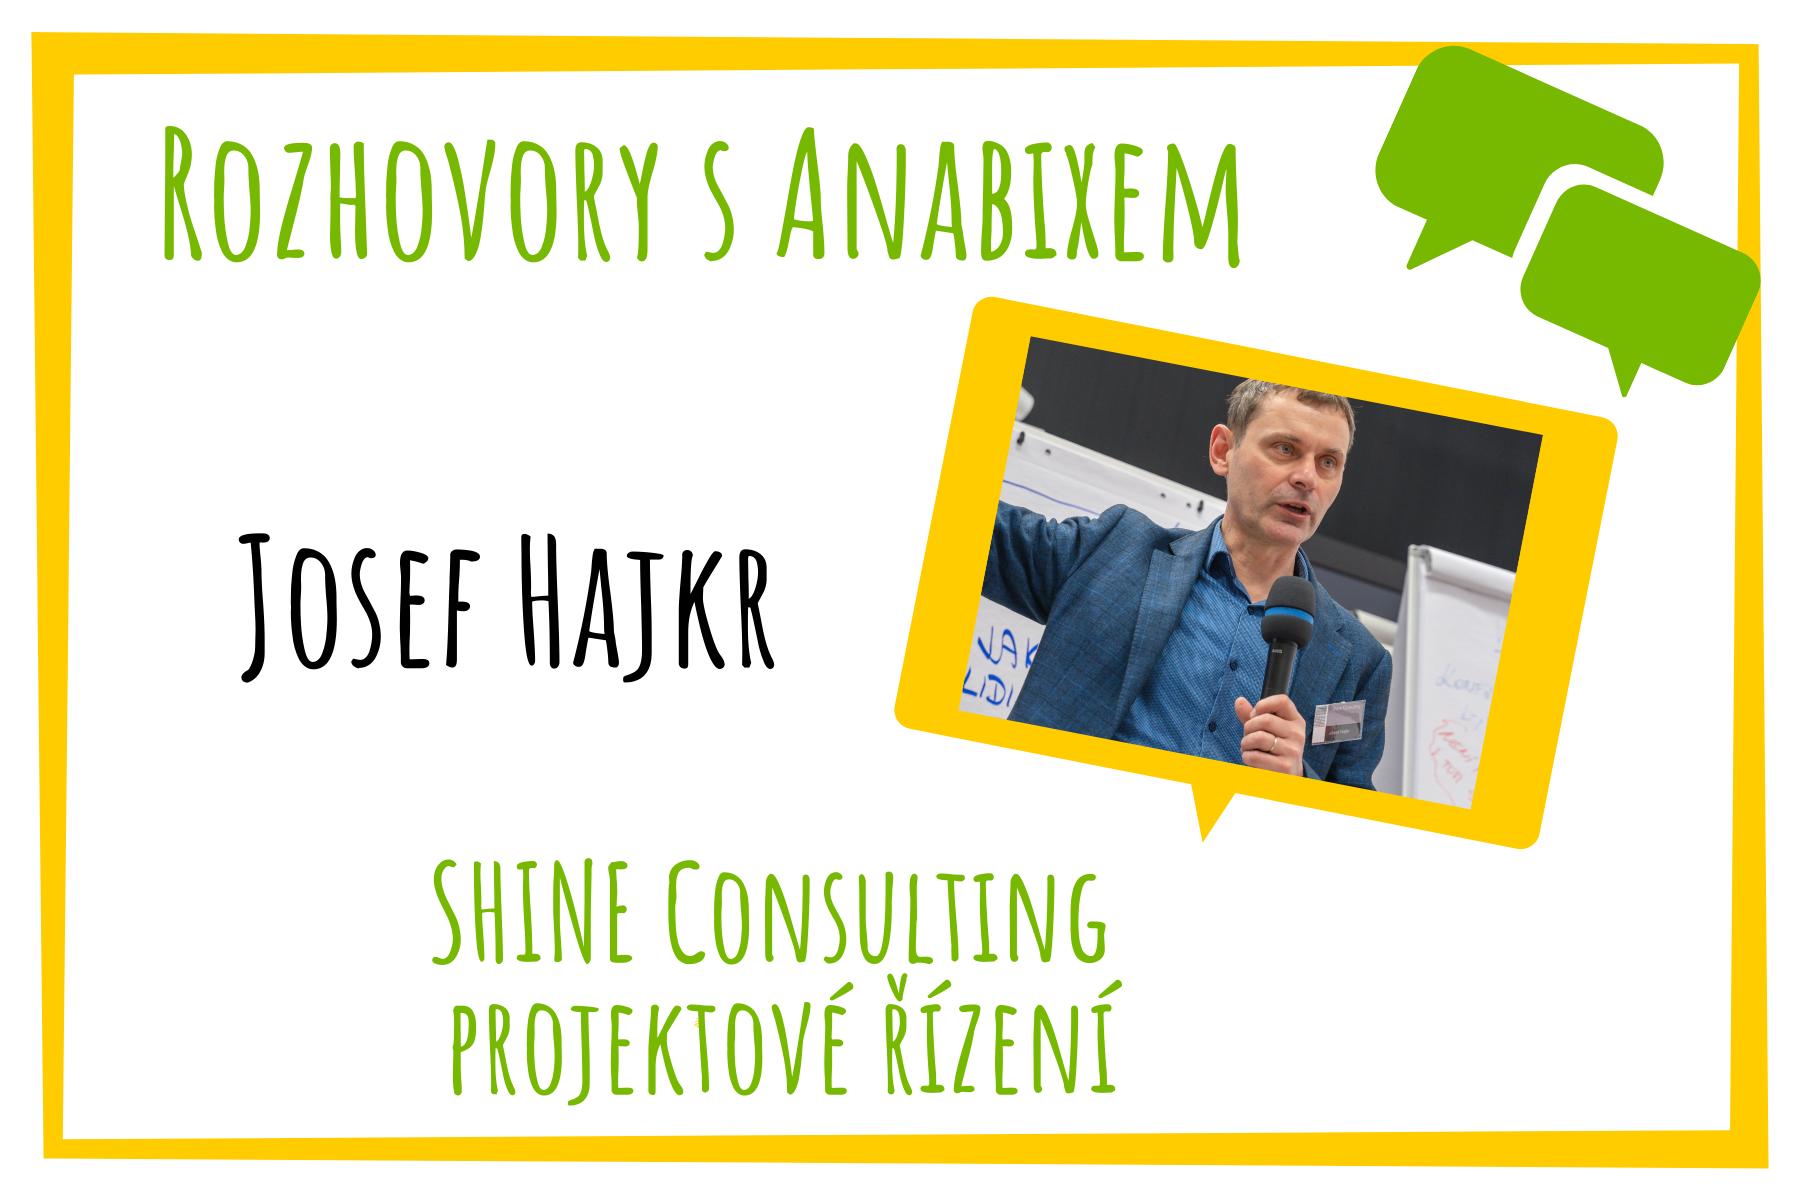 Rozhovory sAnabixem - Josef Hajkr